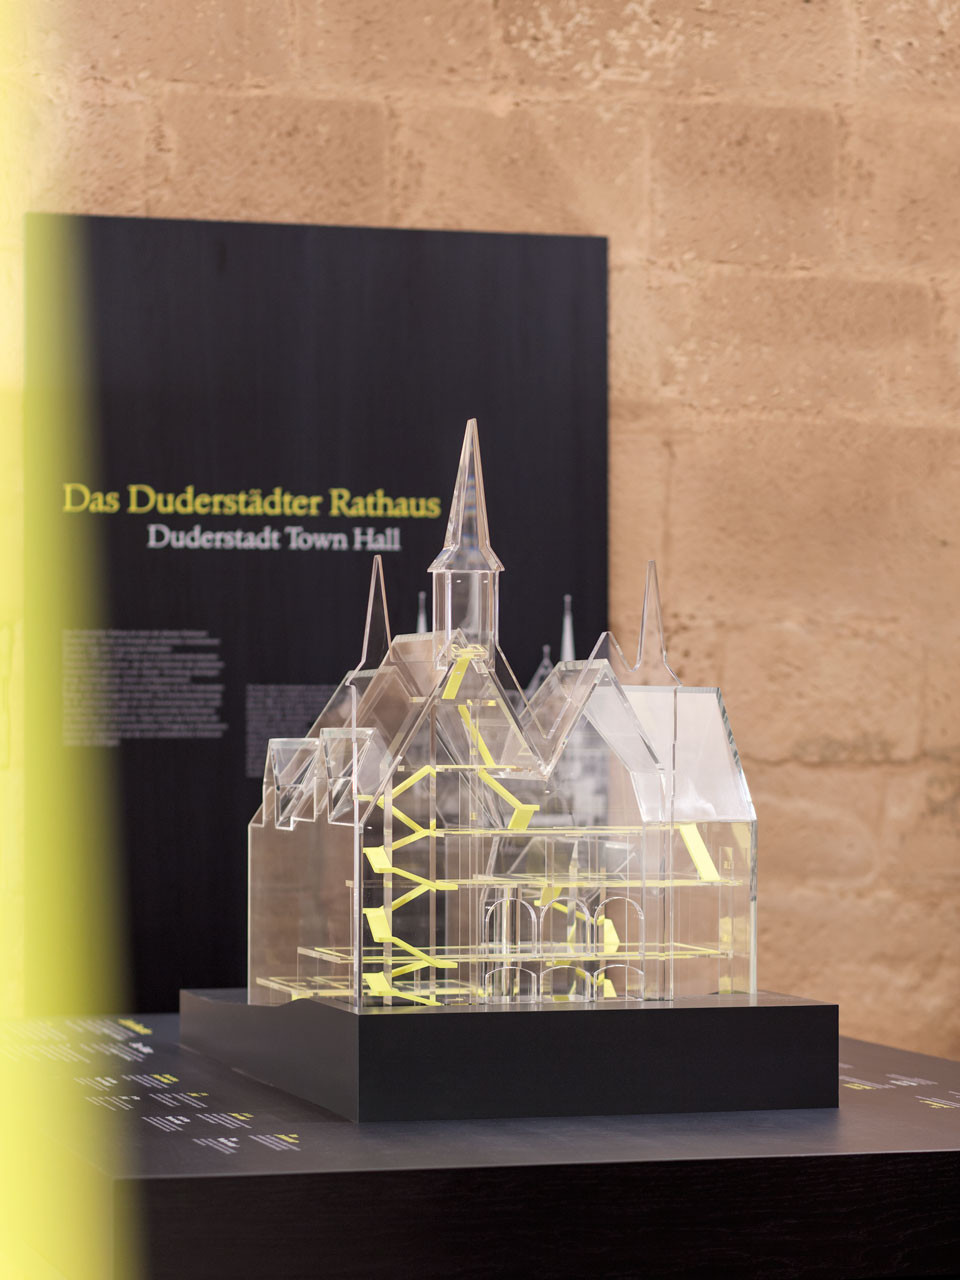 Timo_Stammberger_Duderstadt_Modell_Rathaus